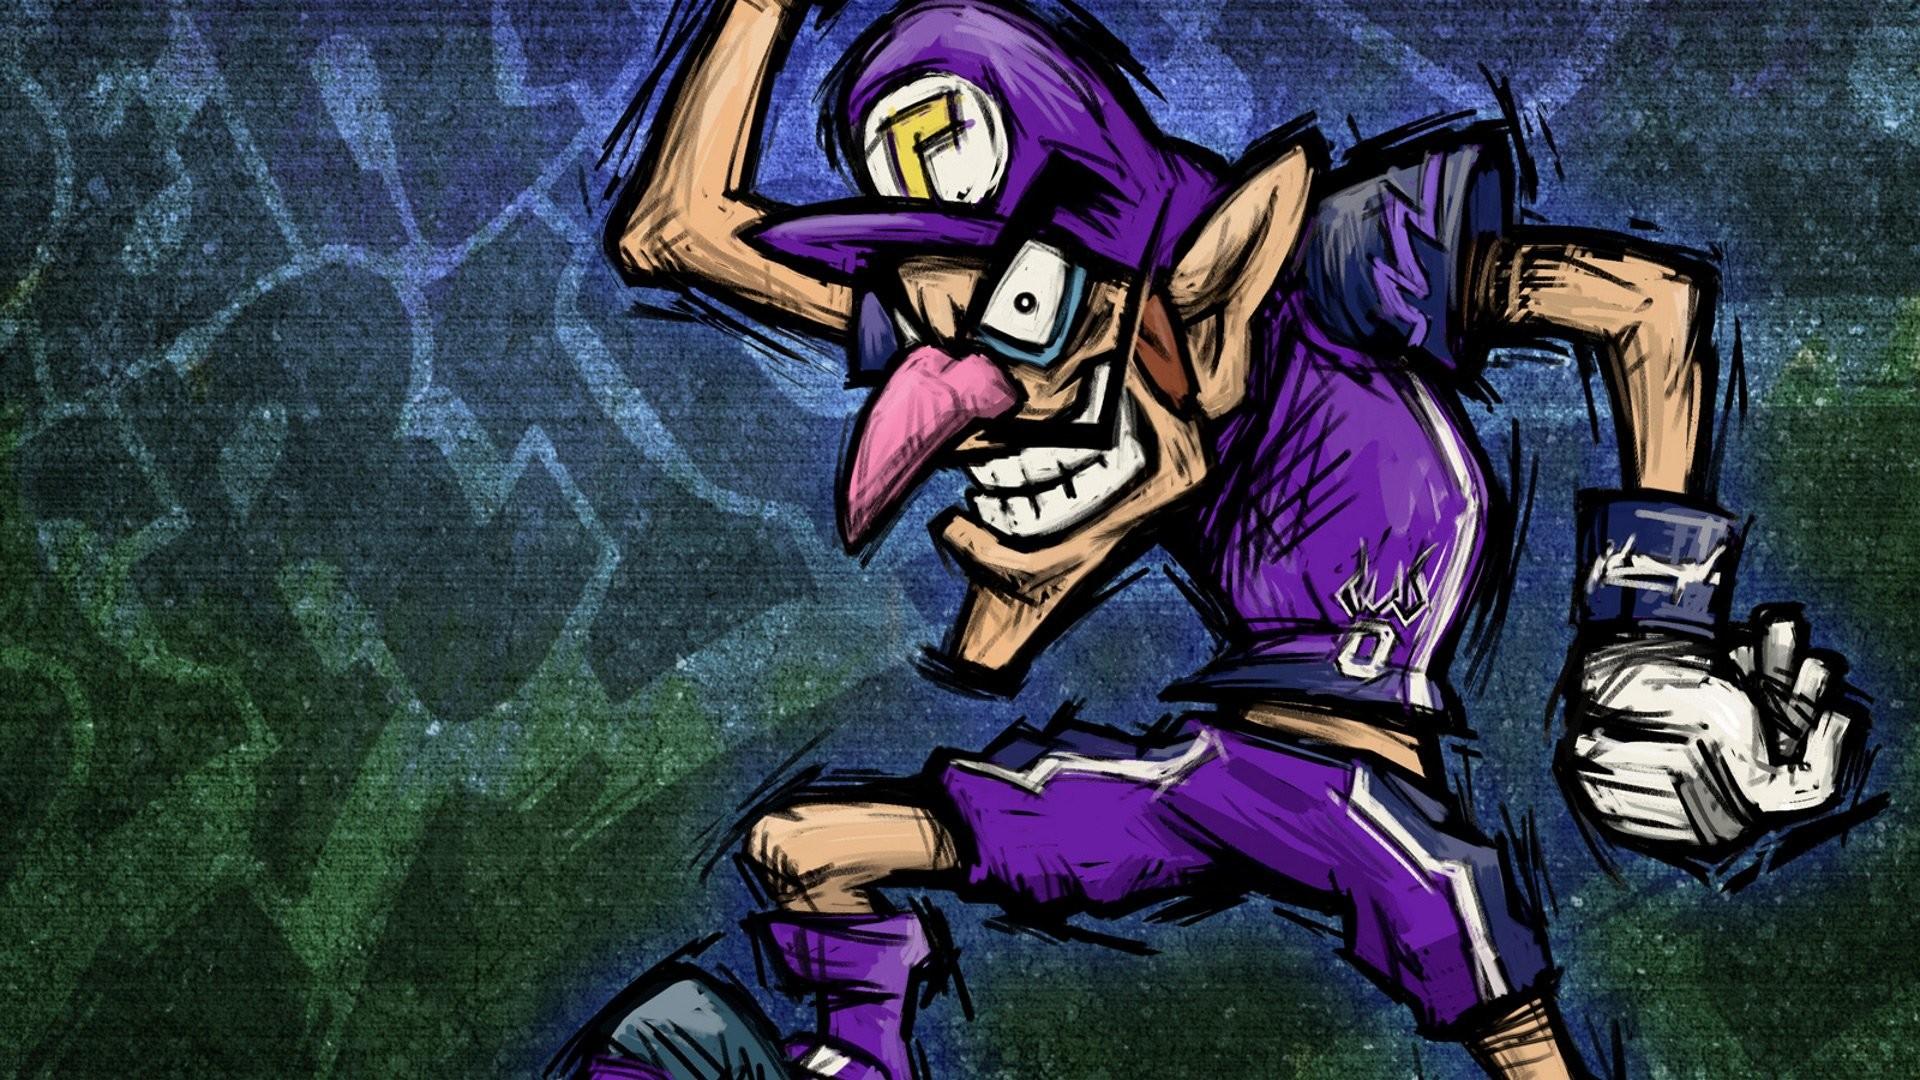 Video Game – Super Mario Strikers Waluigi Wallpaper